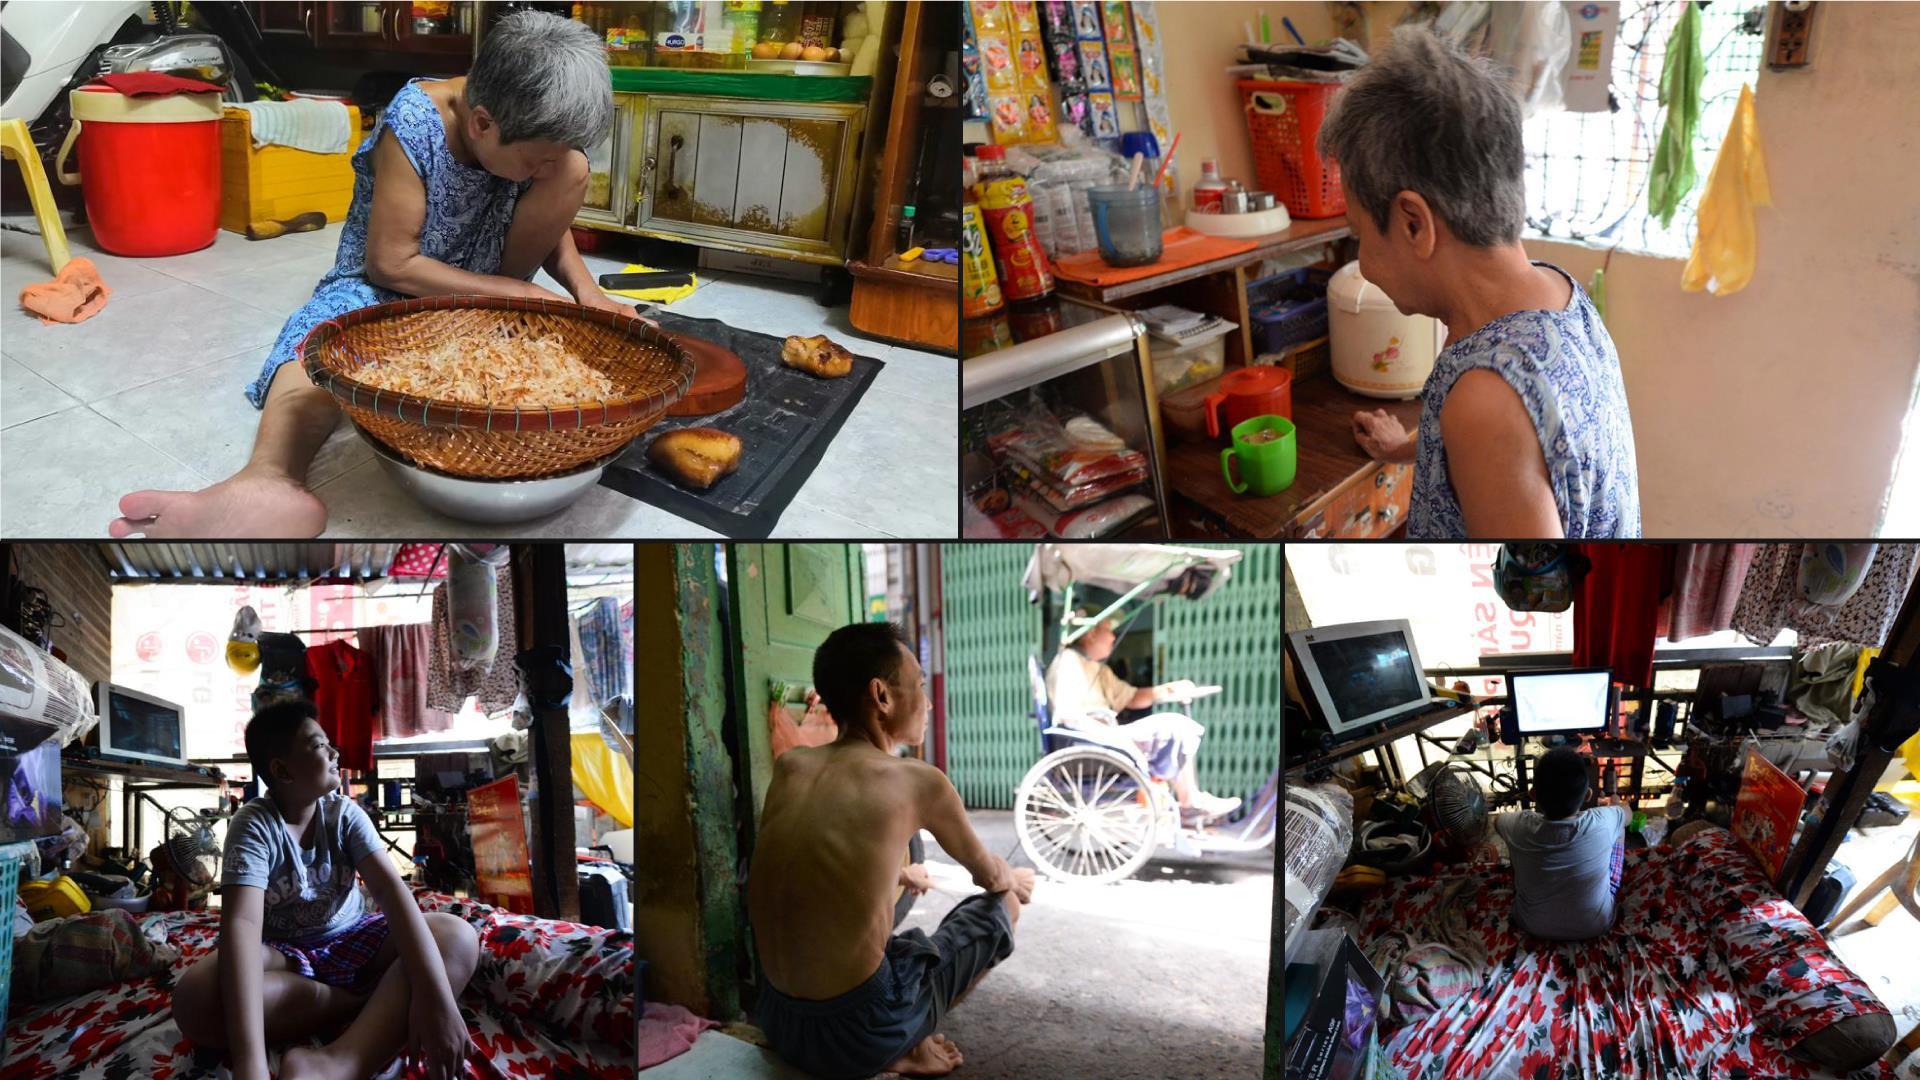 Nhung phan nguoi Sai Gon mac ket sau 27 nam giam ngheo hinh anh 14